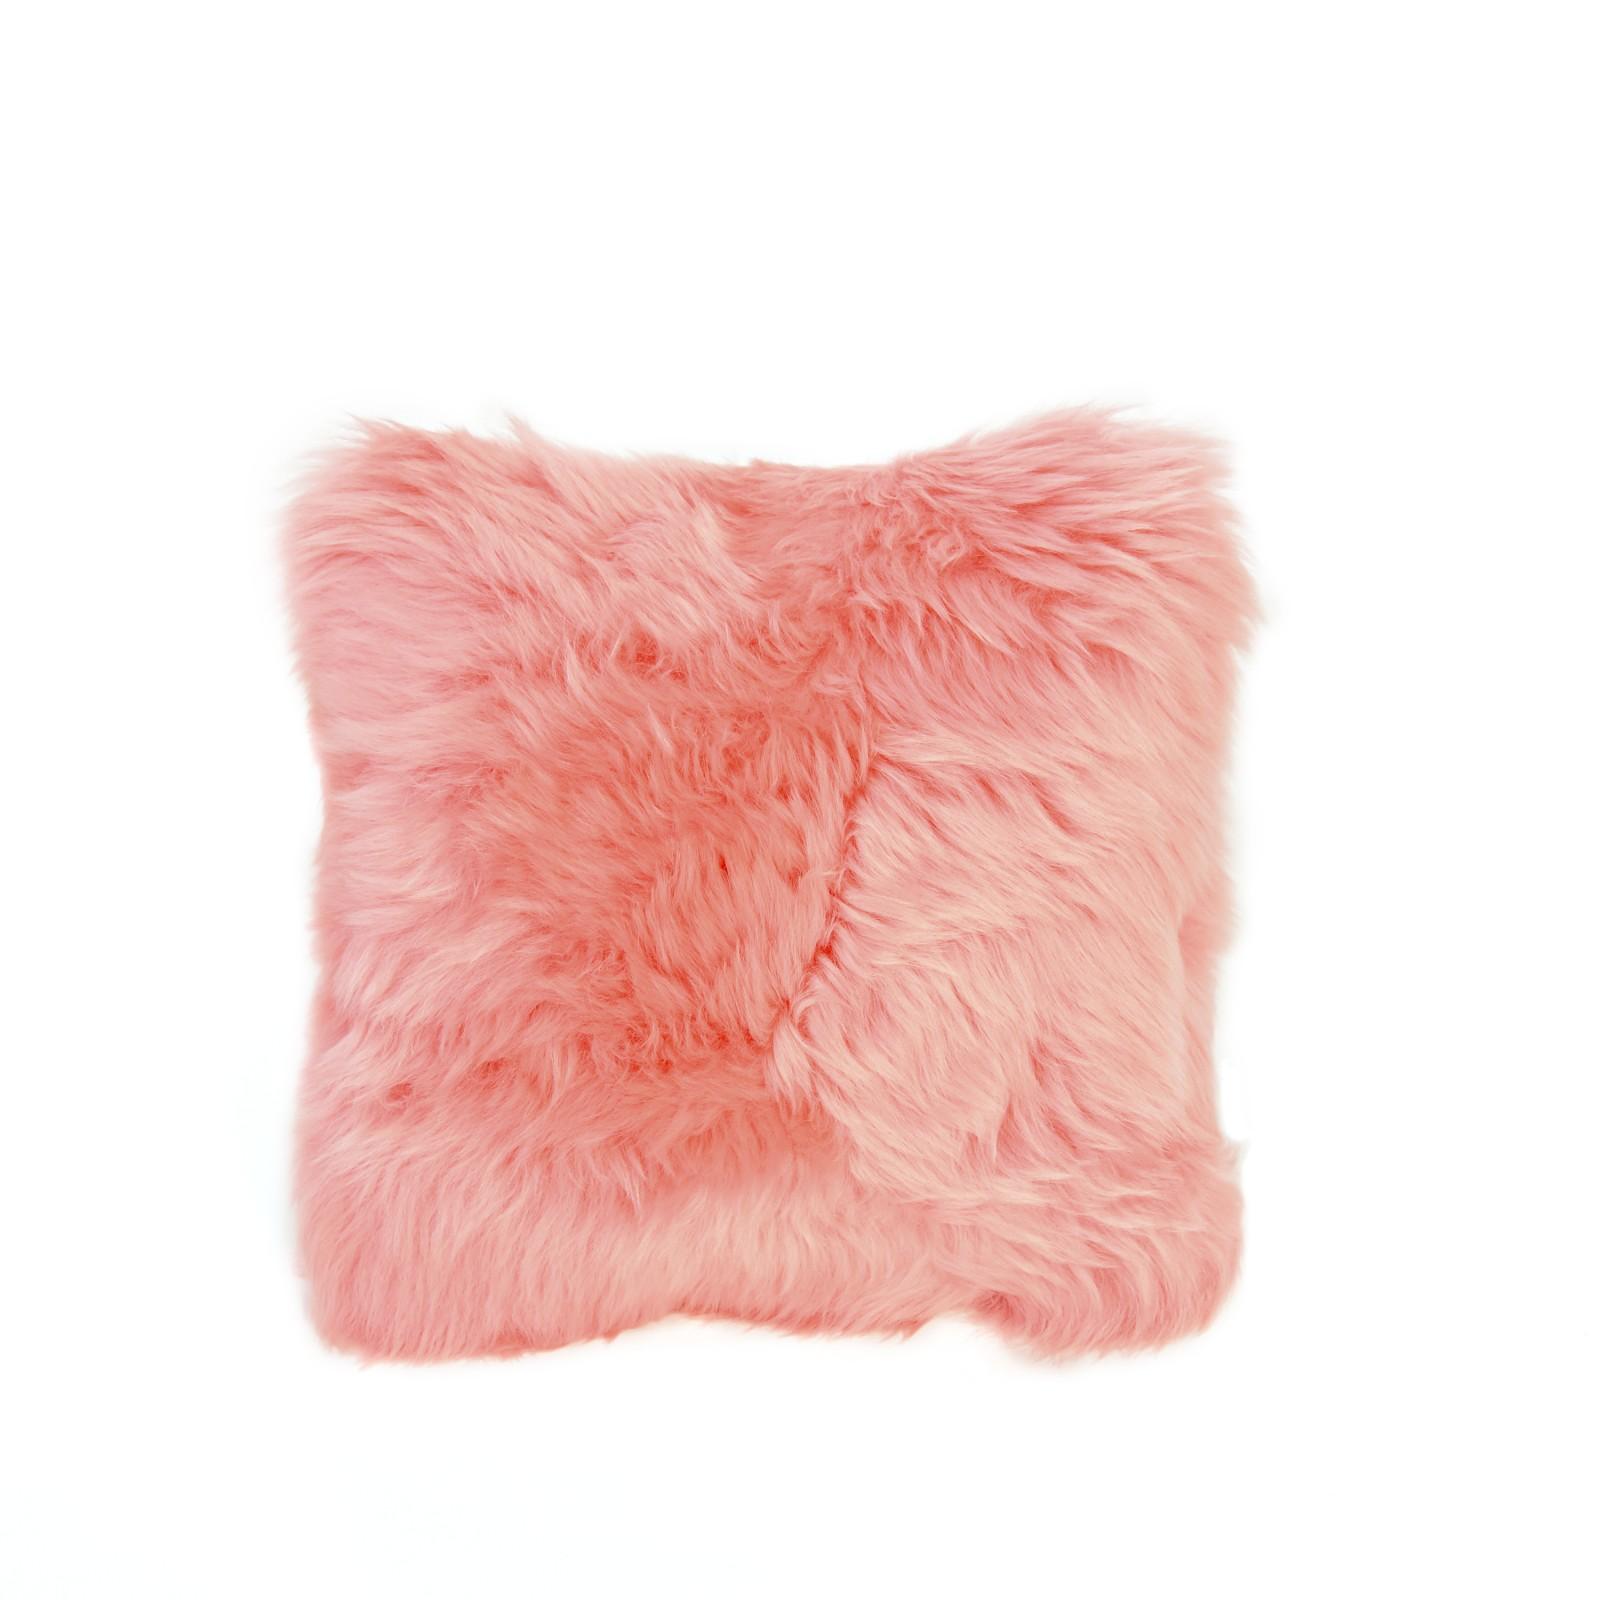 Square Sheepskin Cushion in Baby Pink